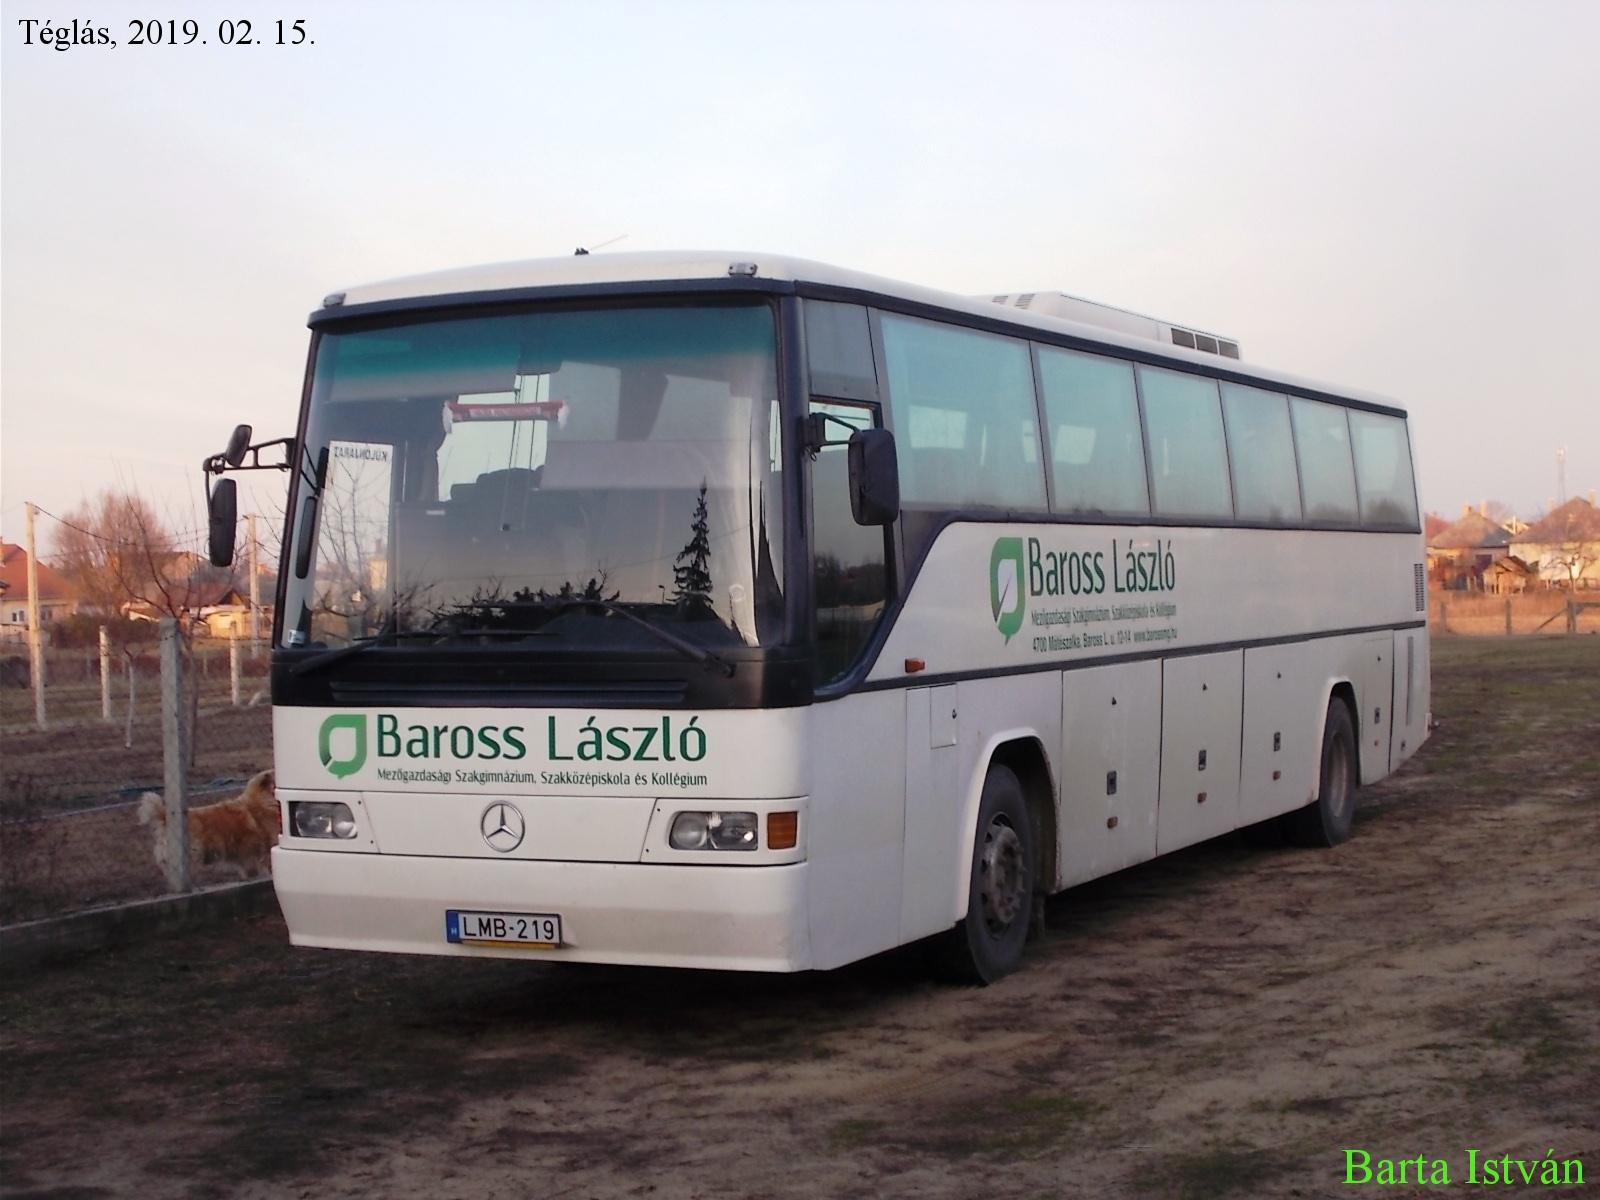 LMB-219